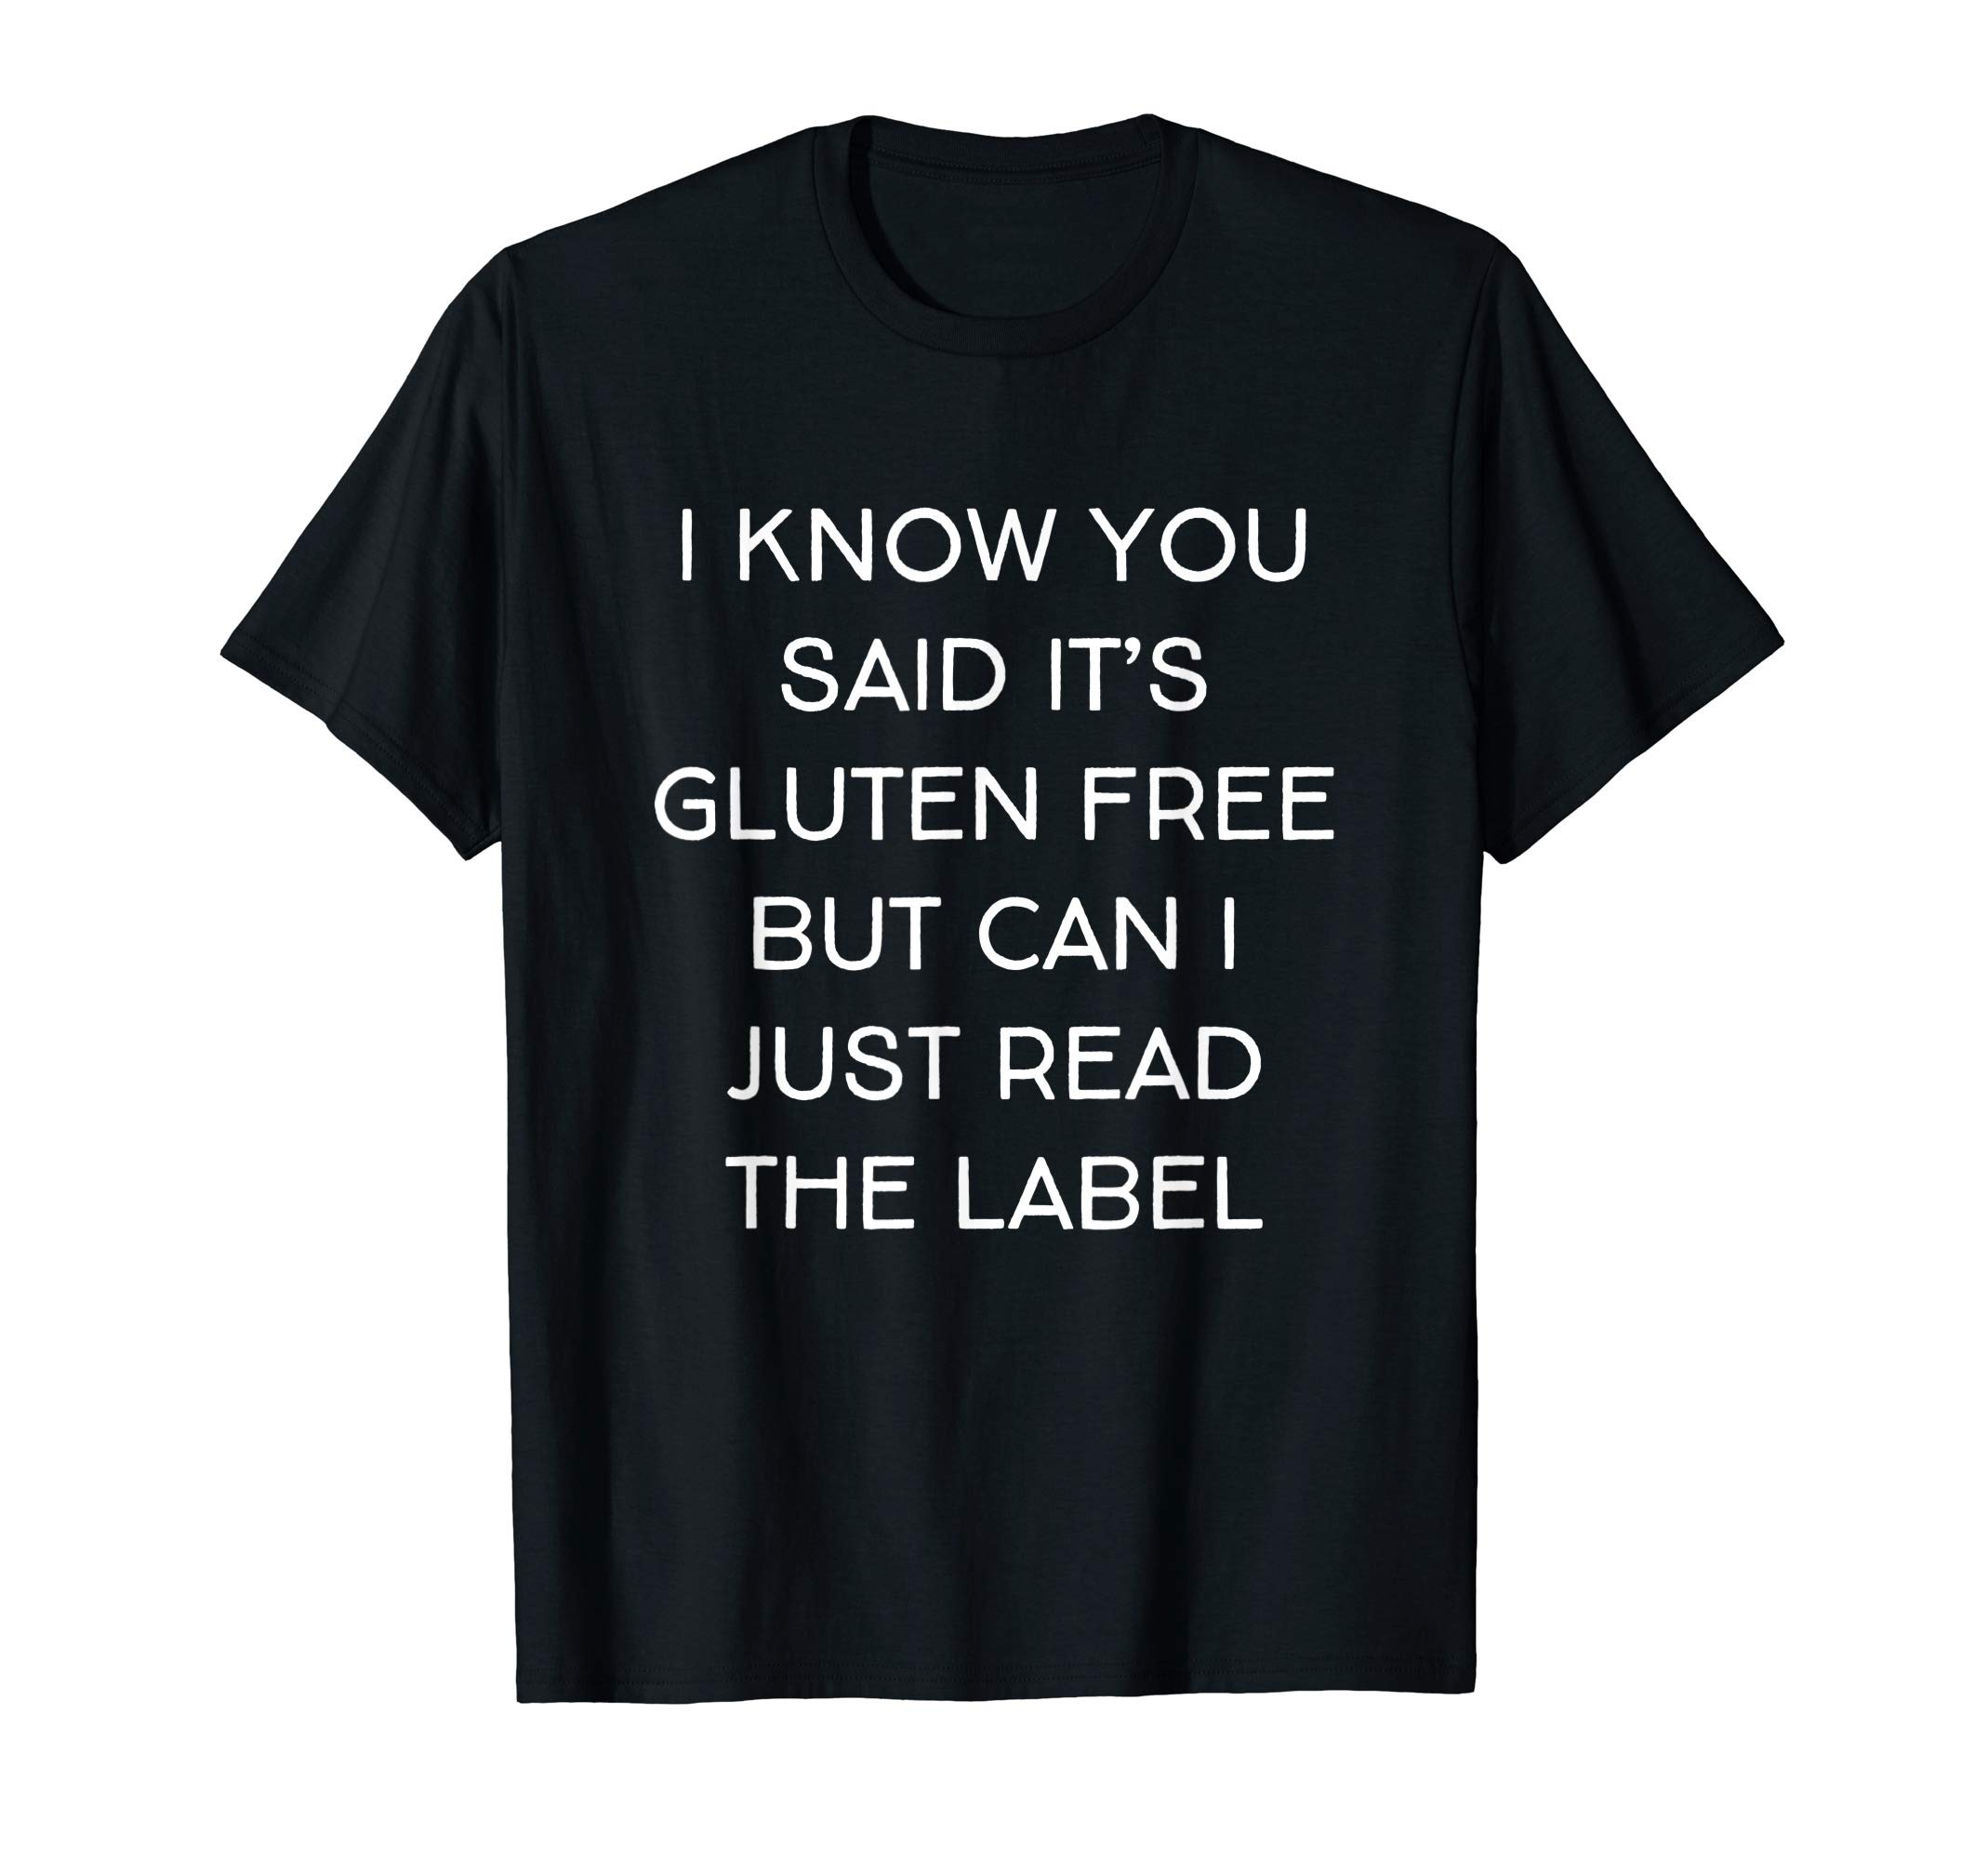 Funny Gluten Intolerant Celiac Gluten Allergy Slogan T-Shirt by TK Gluten Free Shirts